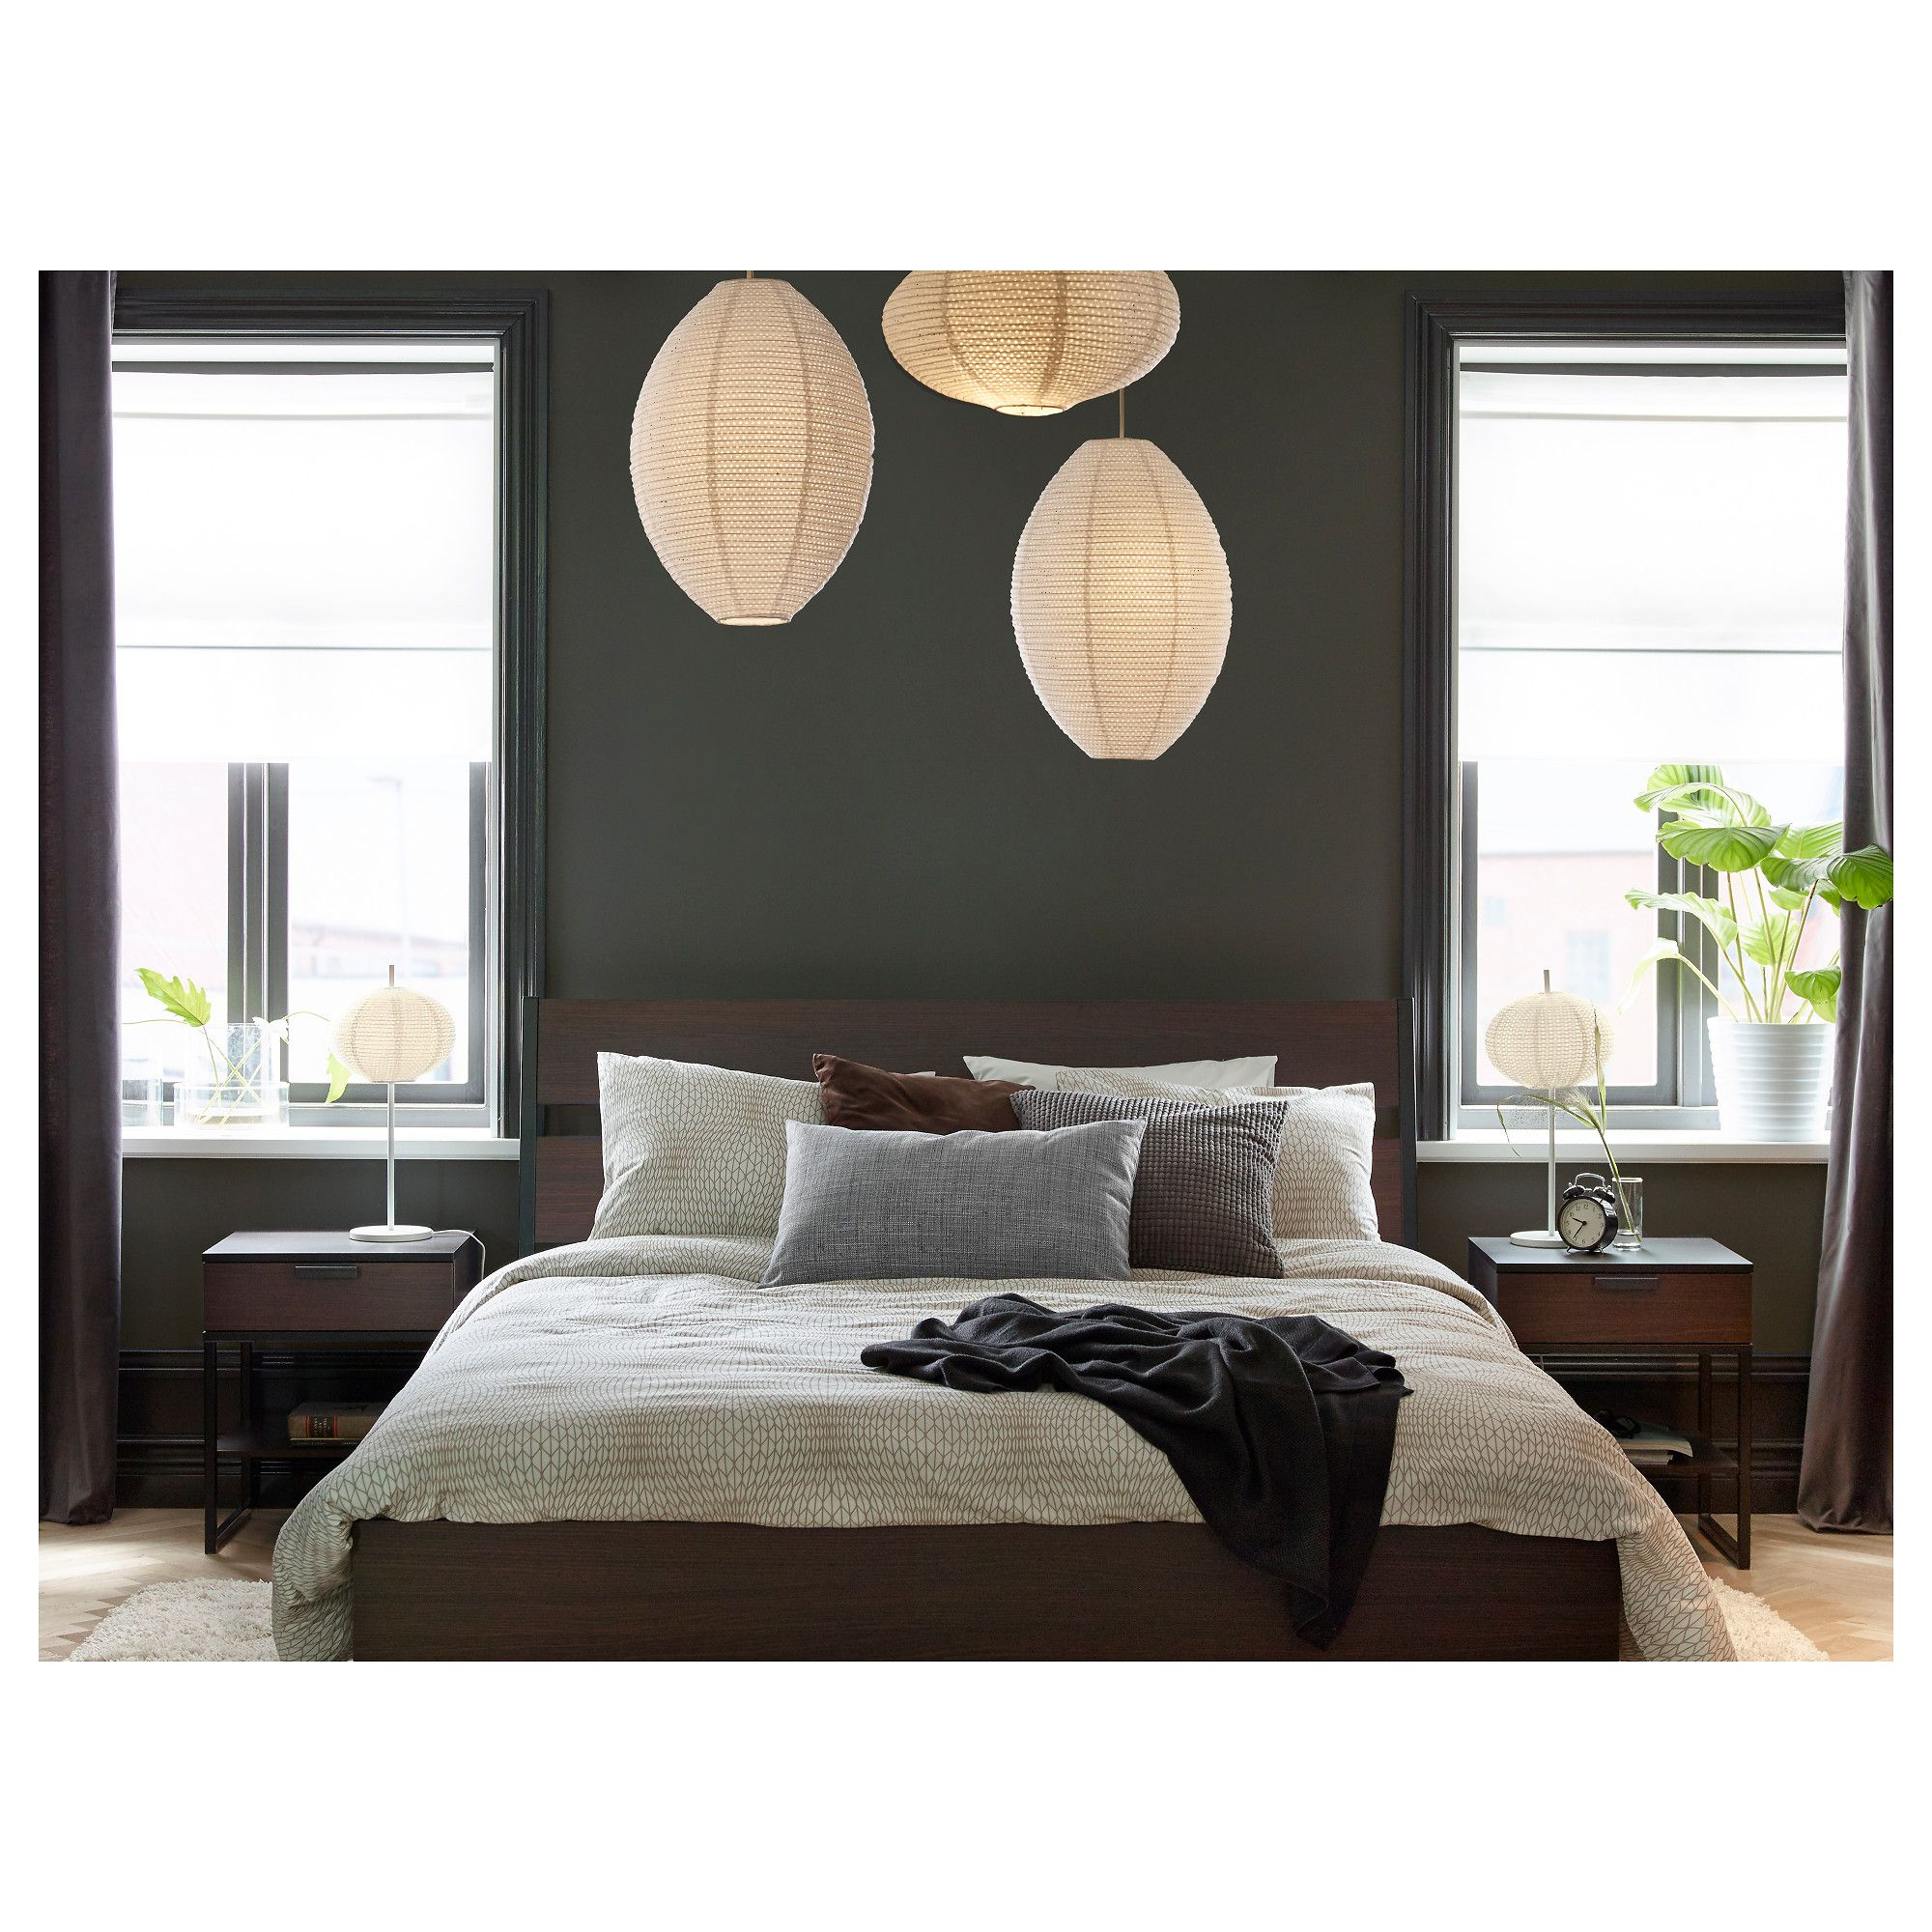 Trysil Bed Frame Dark Brown Luröy